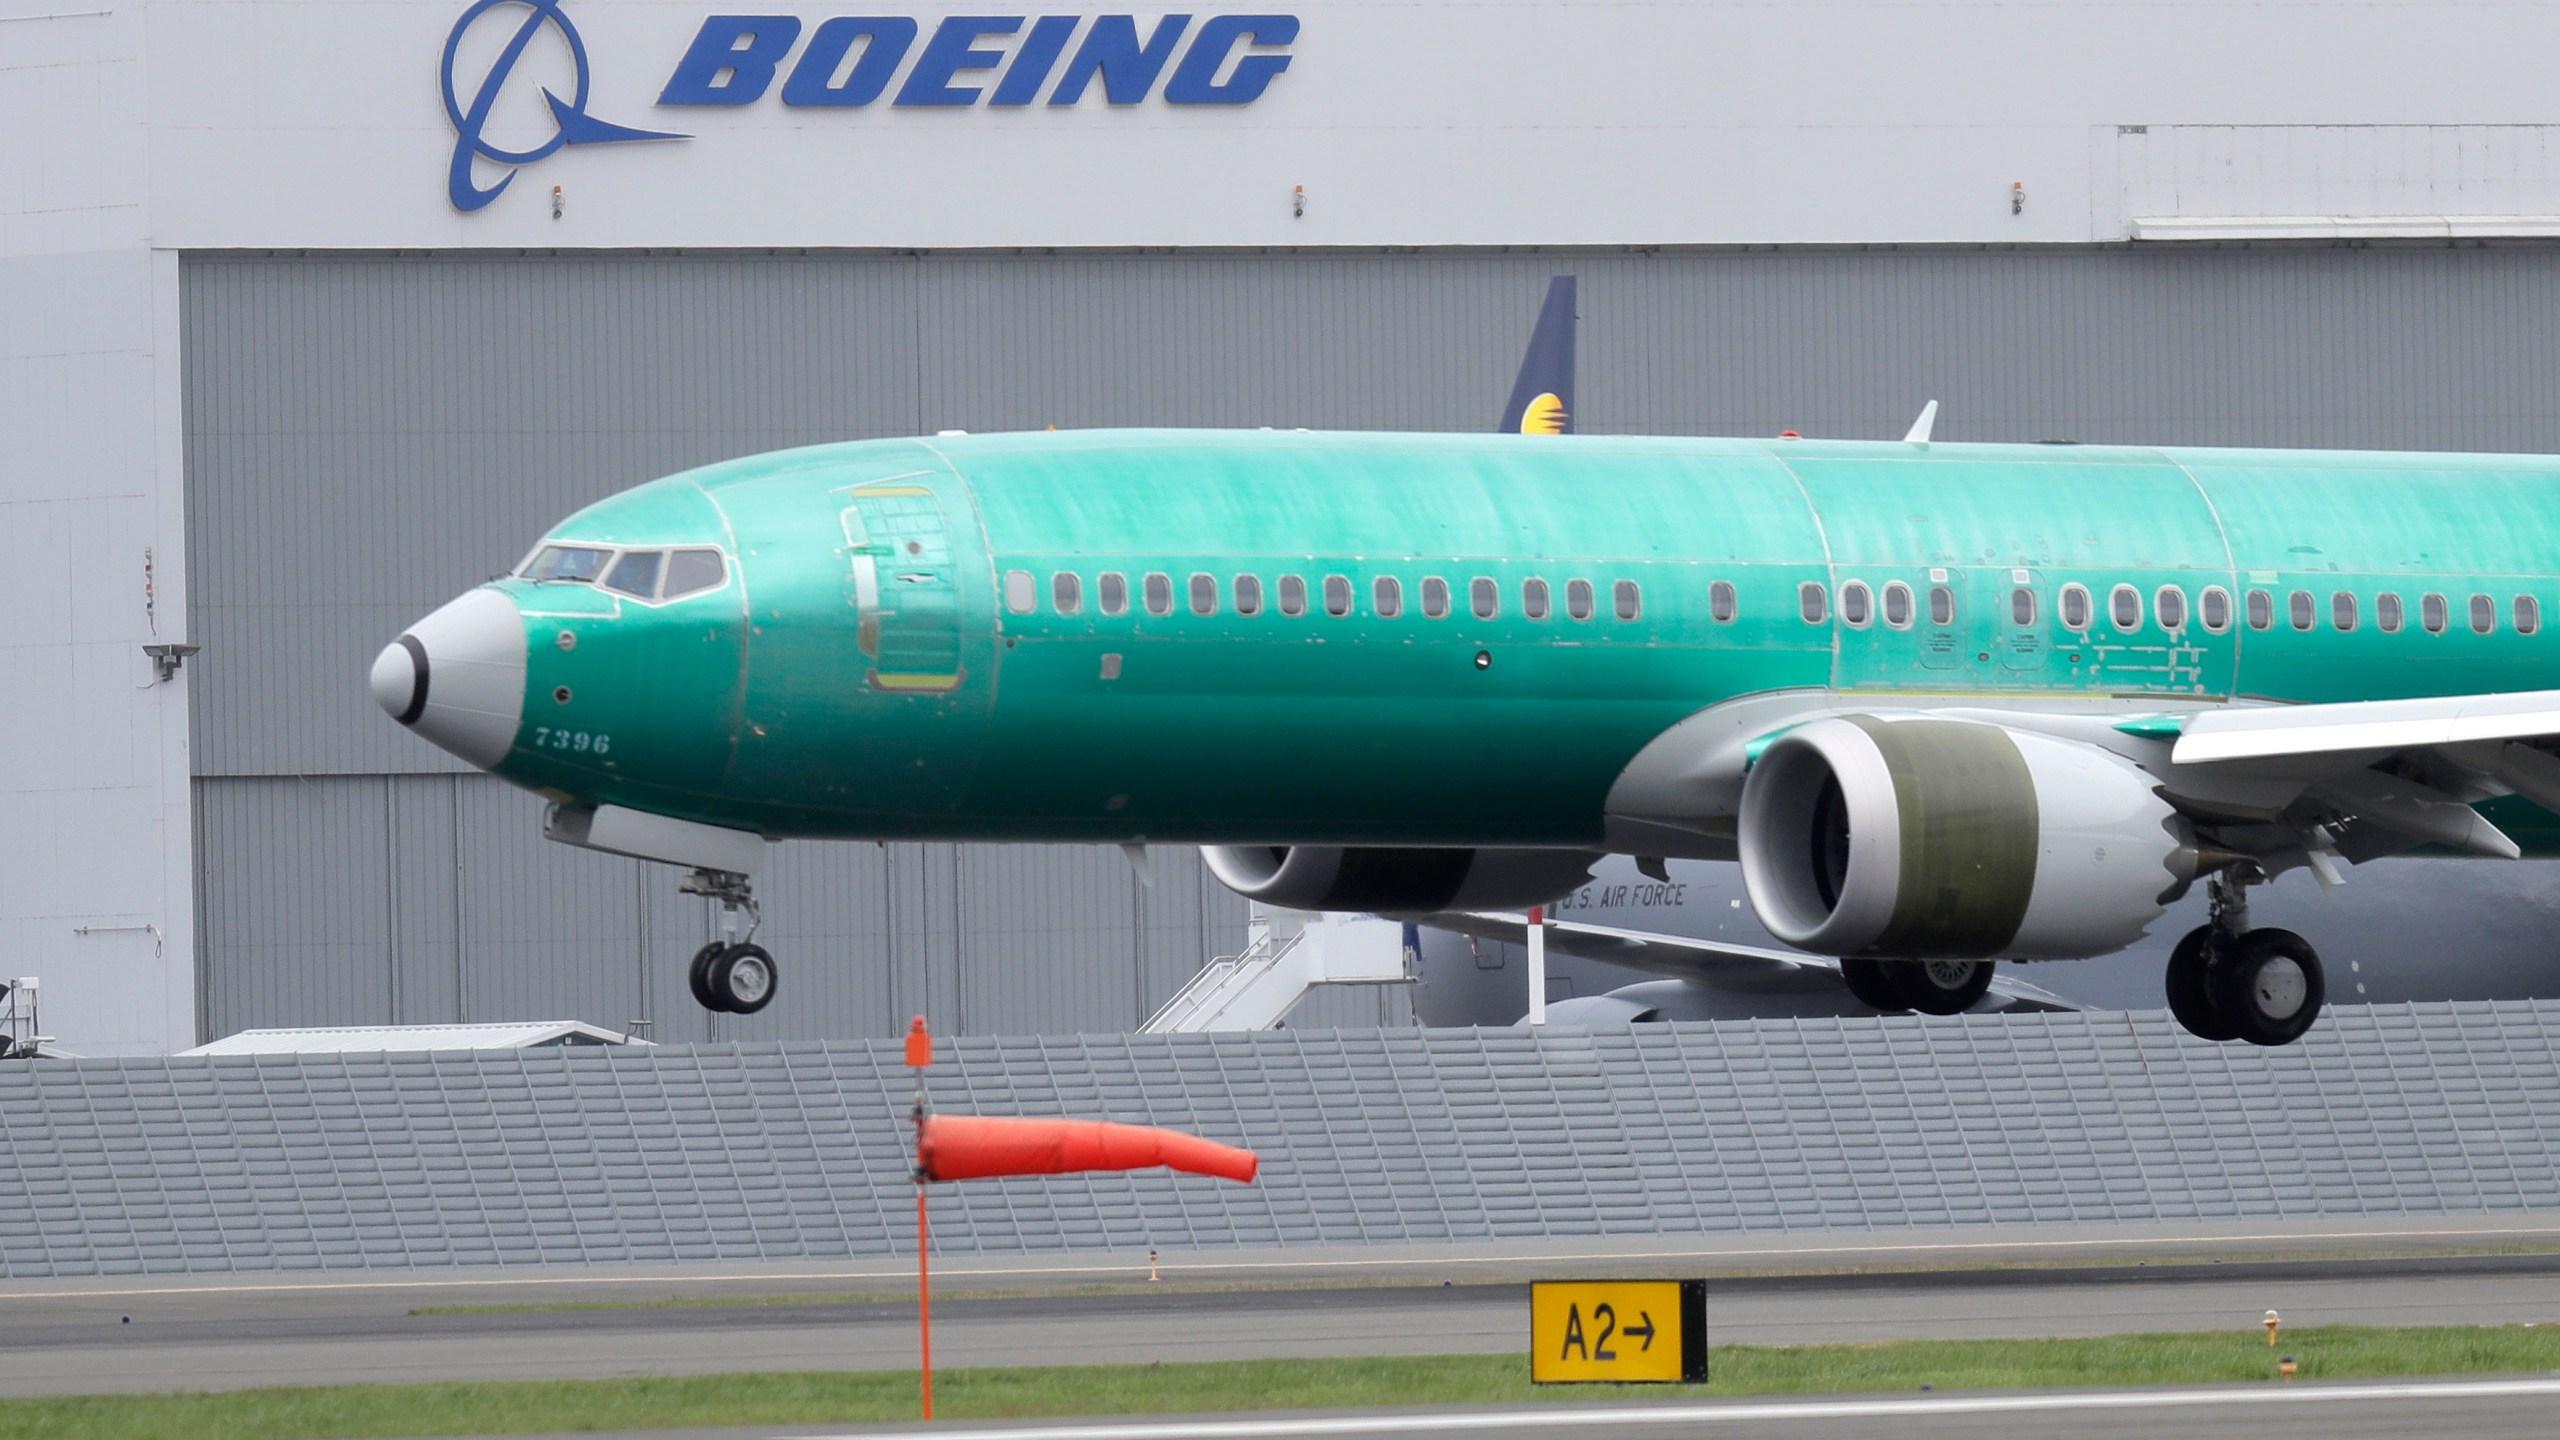 Boeing_Plane_Ethiopia_Whistleblower_89094-159532.jpg16658288